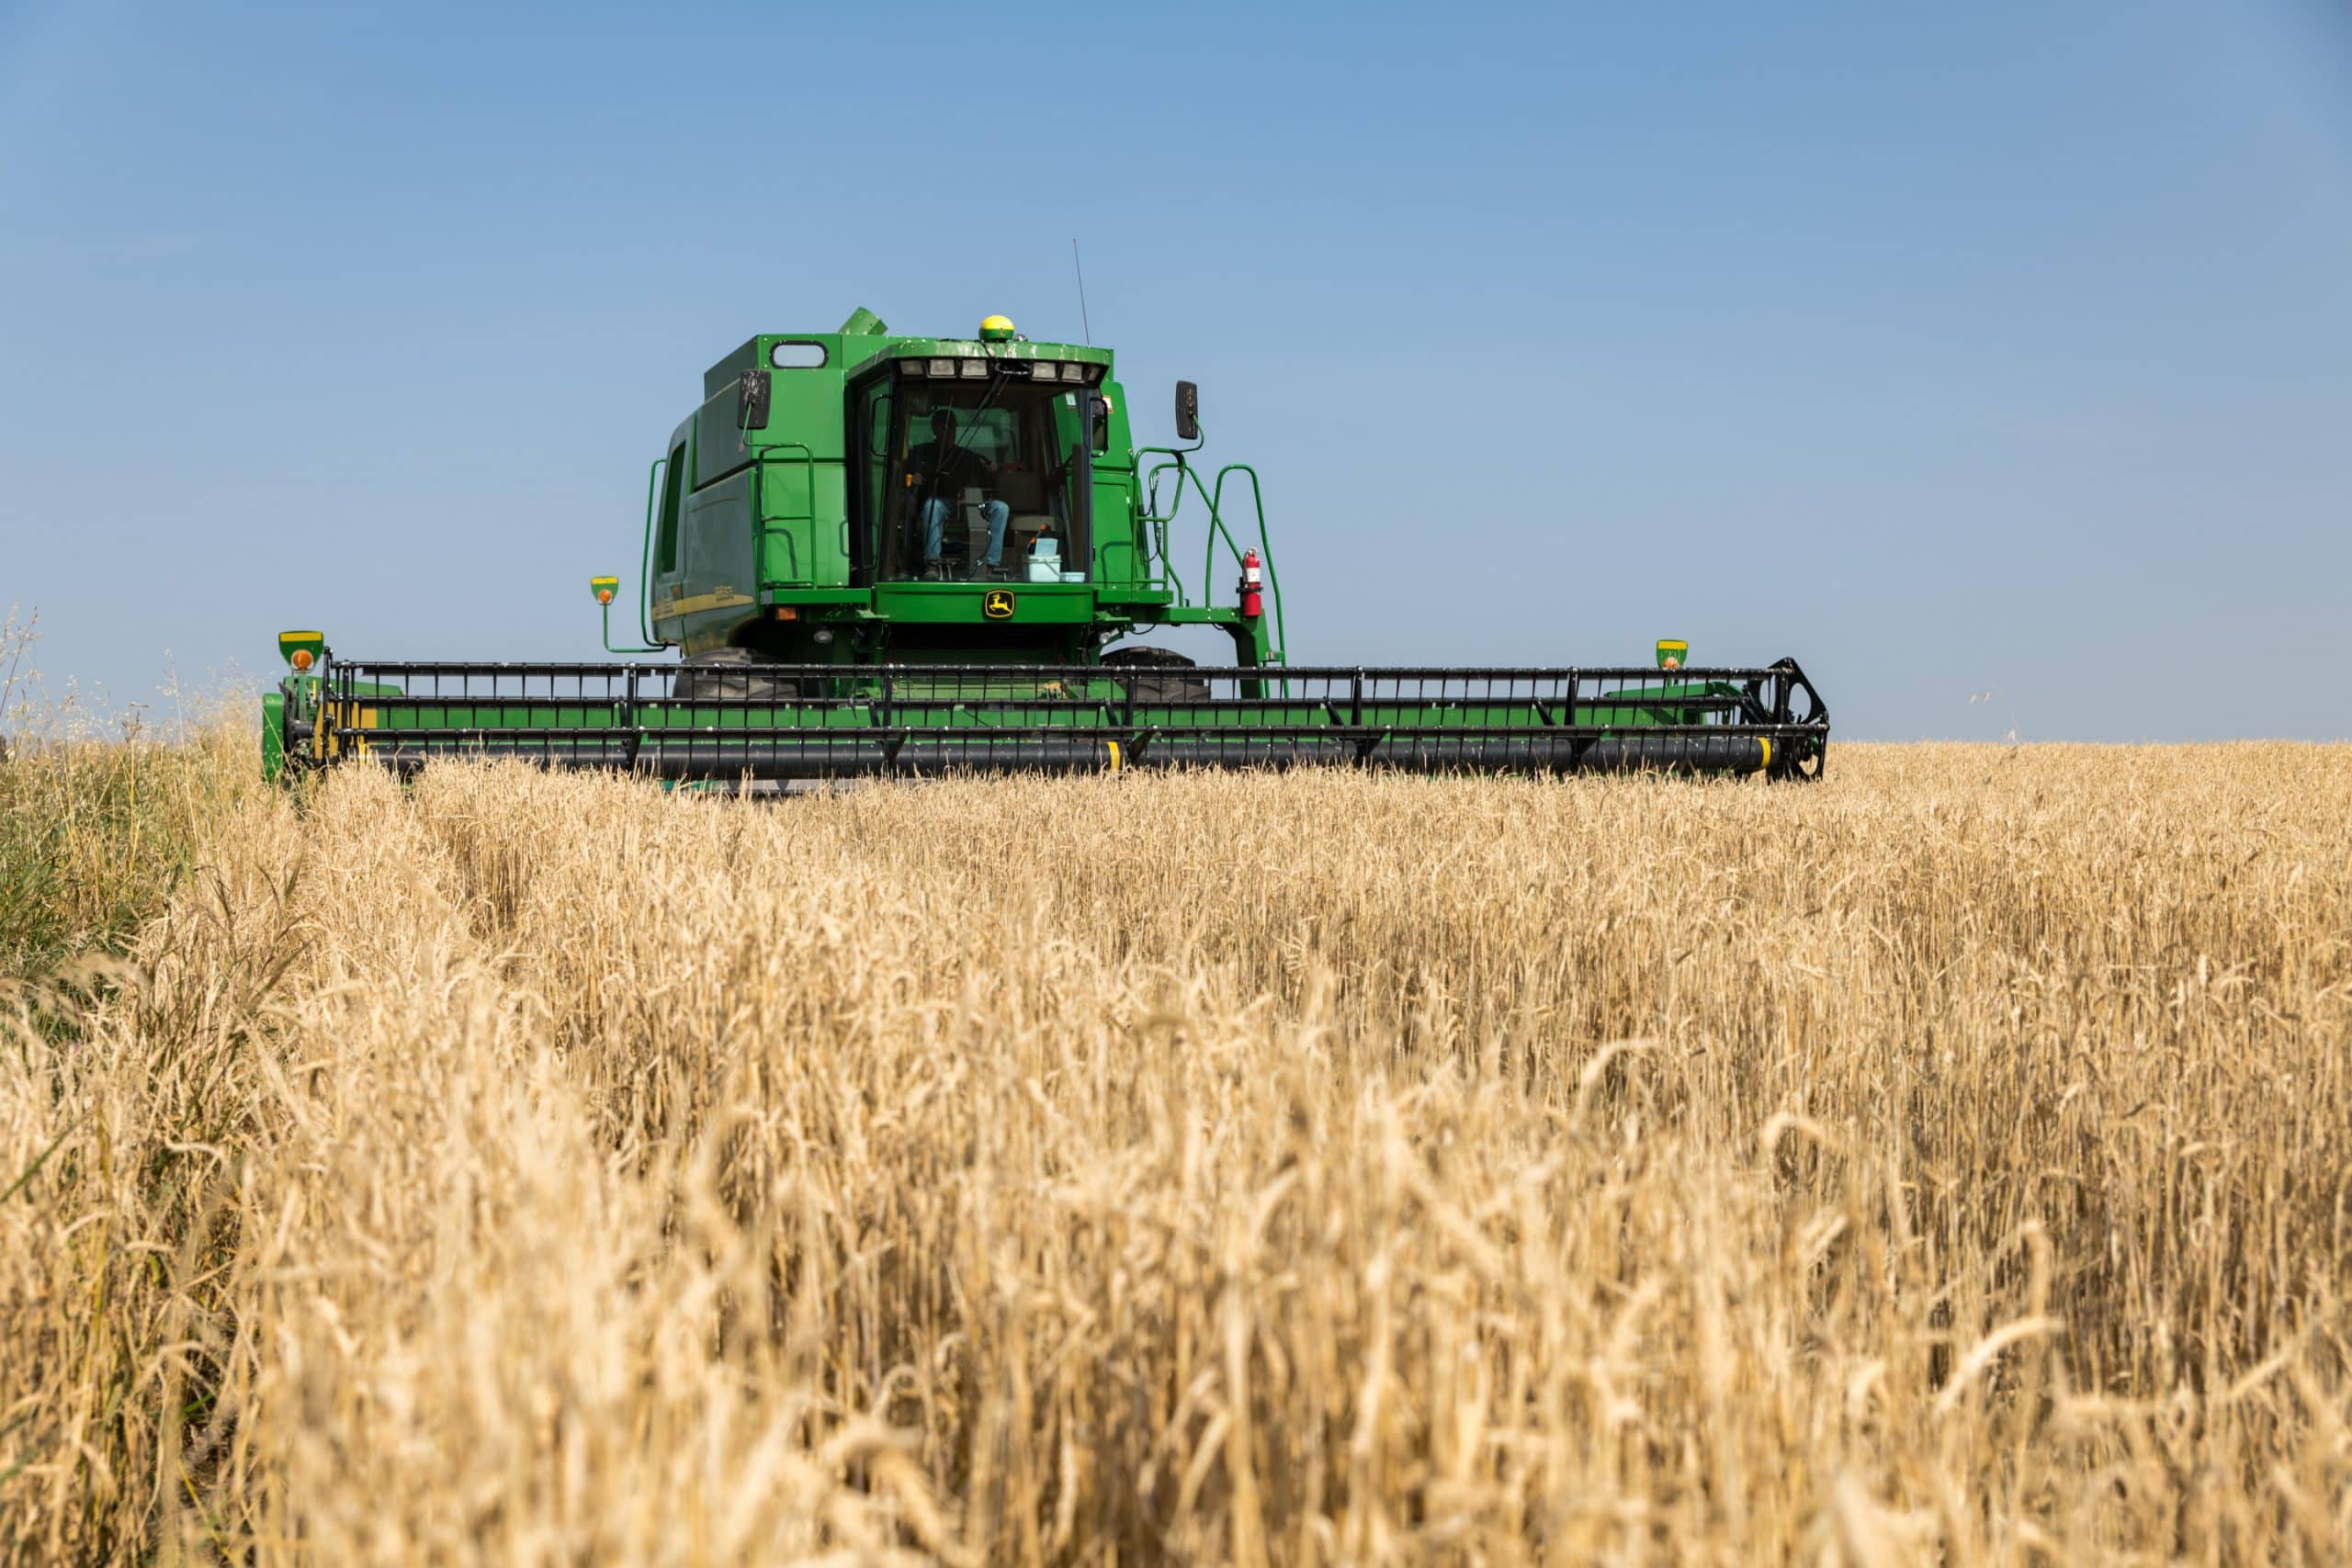 John Deere combine harvesting wheat in Olds, Alberta.